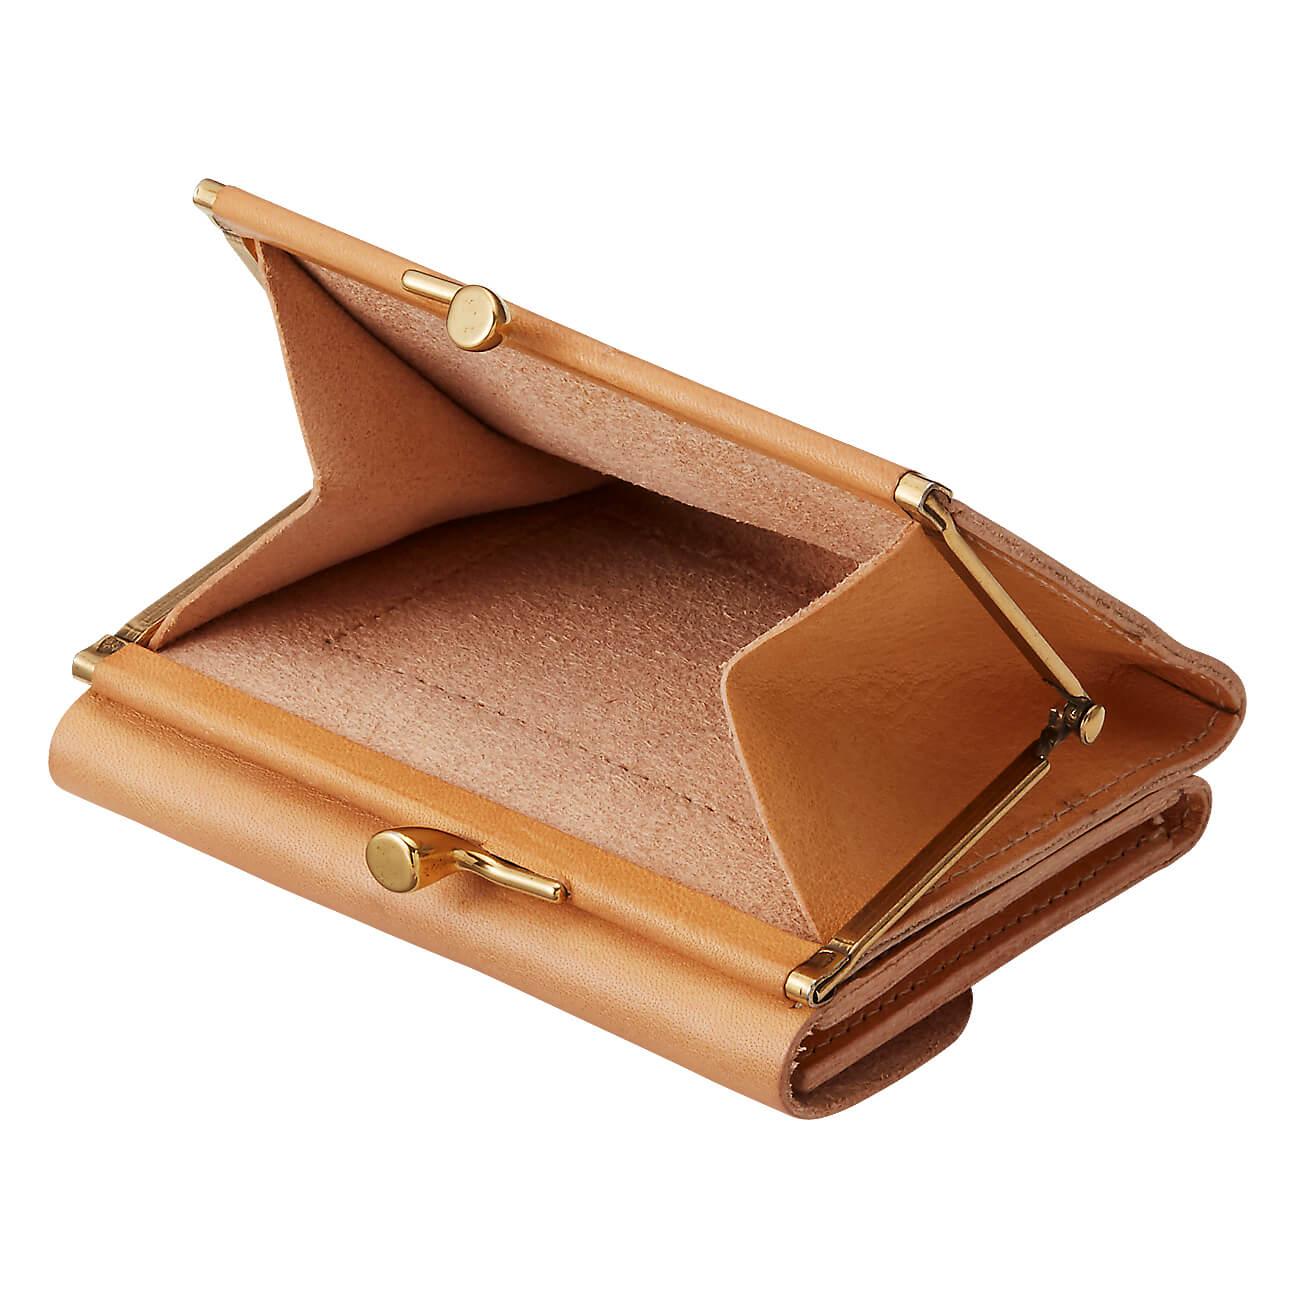 IL BISONTE (イル ビゾンテ) 日本公式オンラインストア 2つ折財布 54192304440